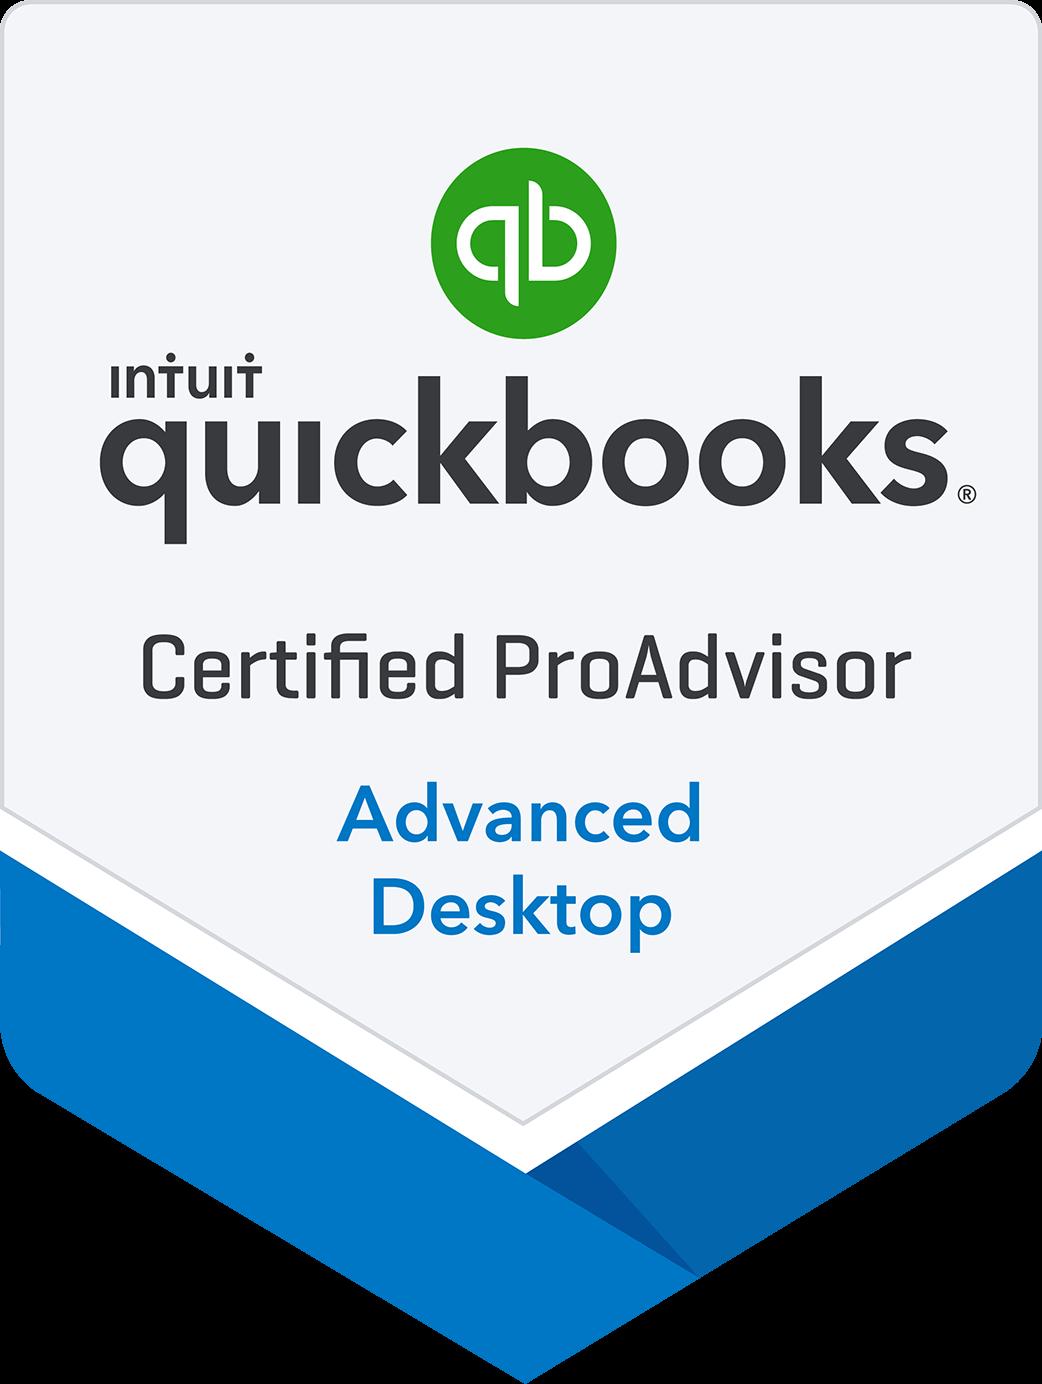 Certified Advanced QuickBooks Desktop Proadvisor in New York, Long Island, Nassau & Suffolk Counties, Queens, and Brooklyn